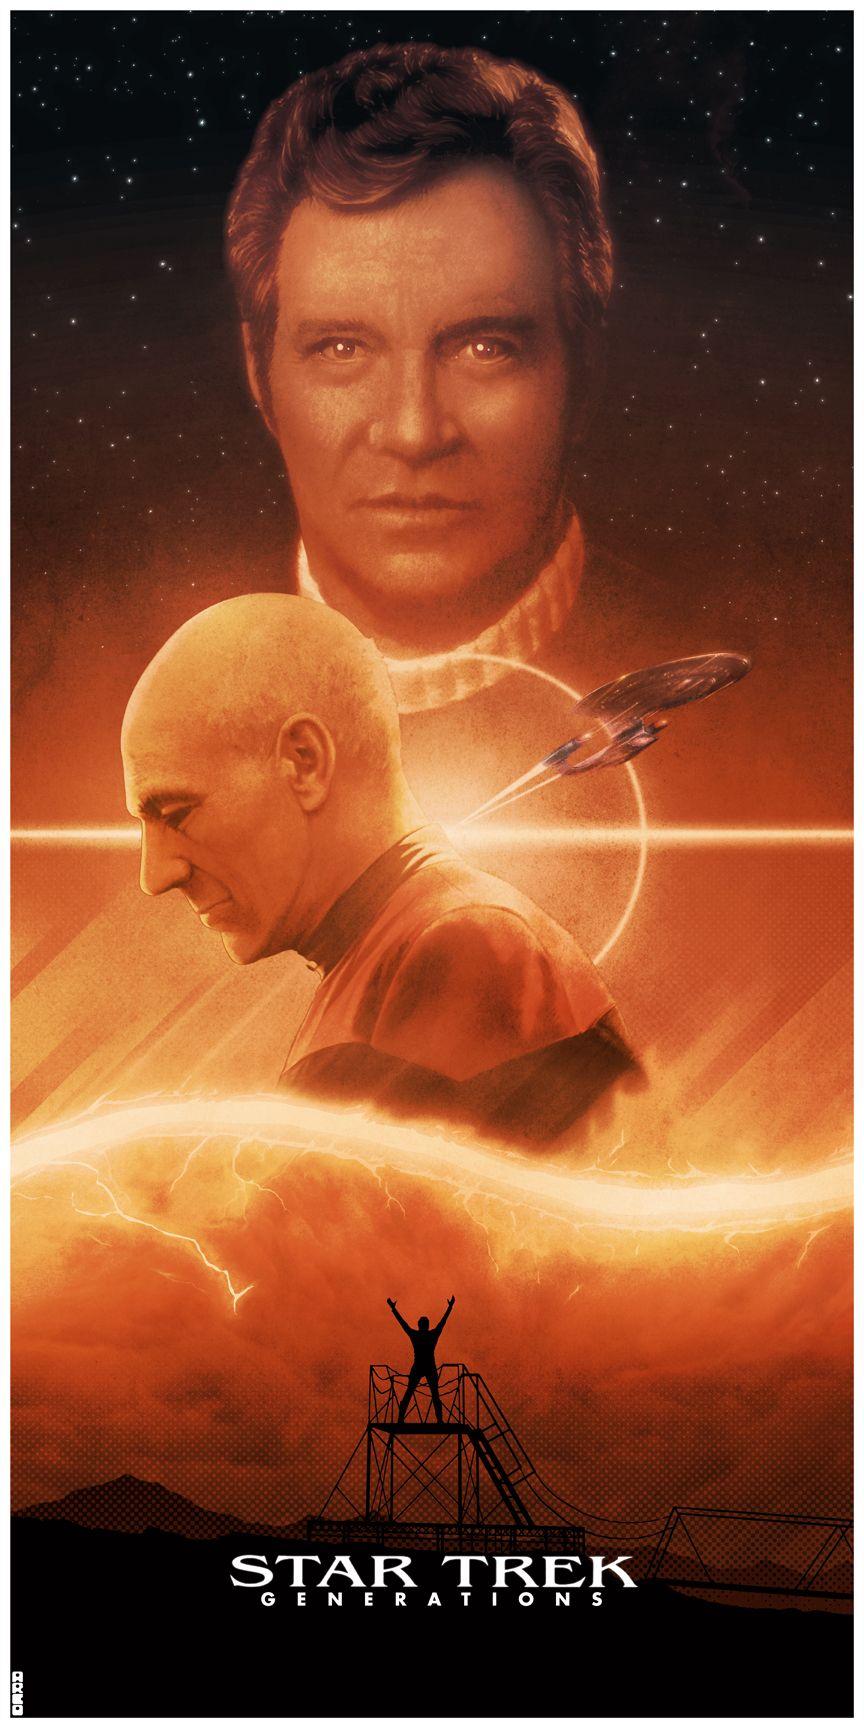 Star Trek Generations By Matt Ferguson Submitted By Crome -2388